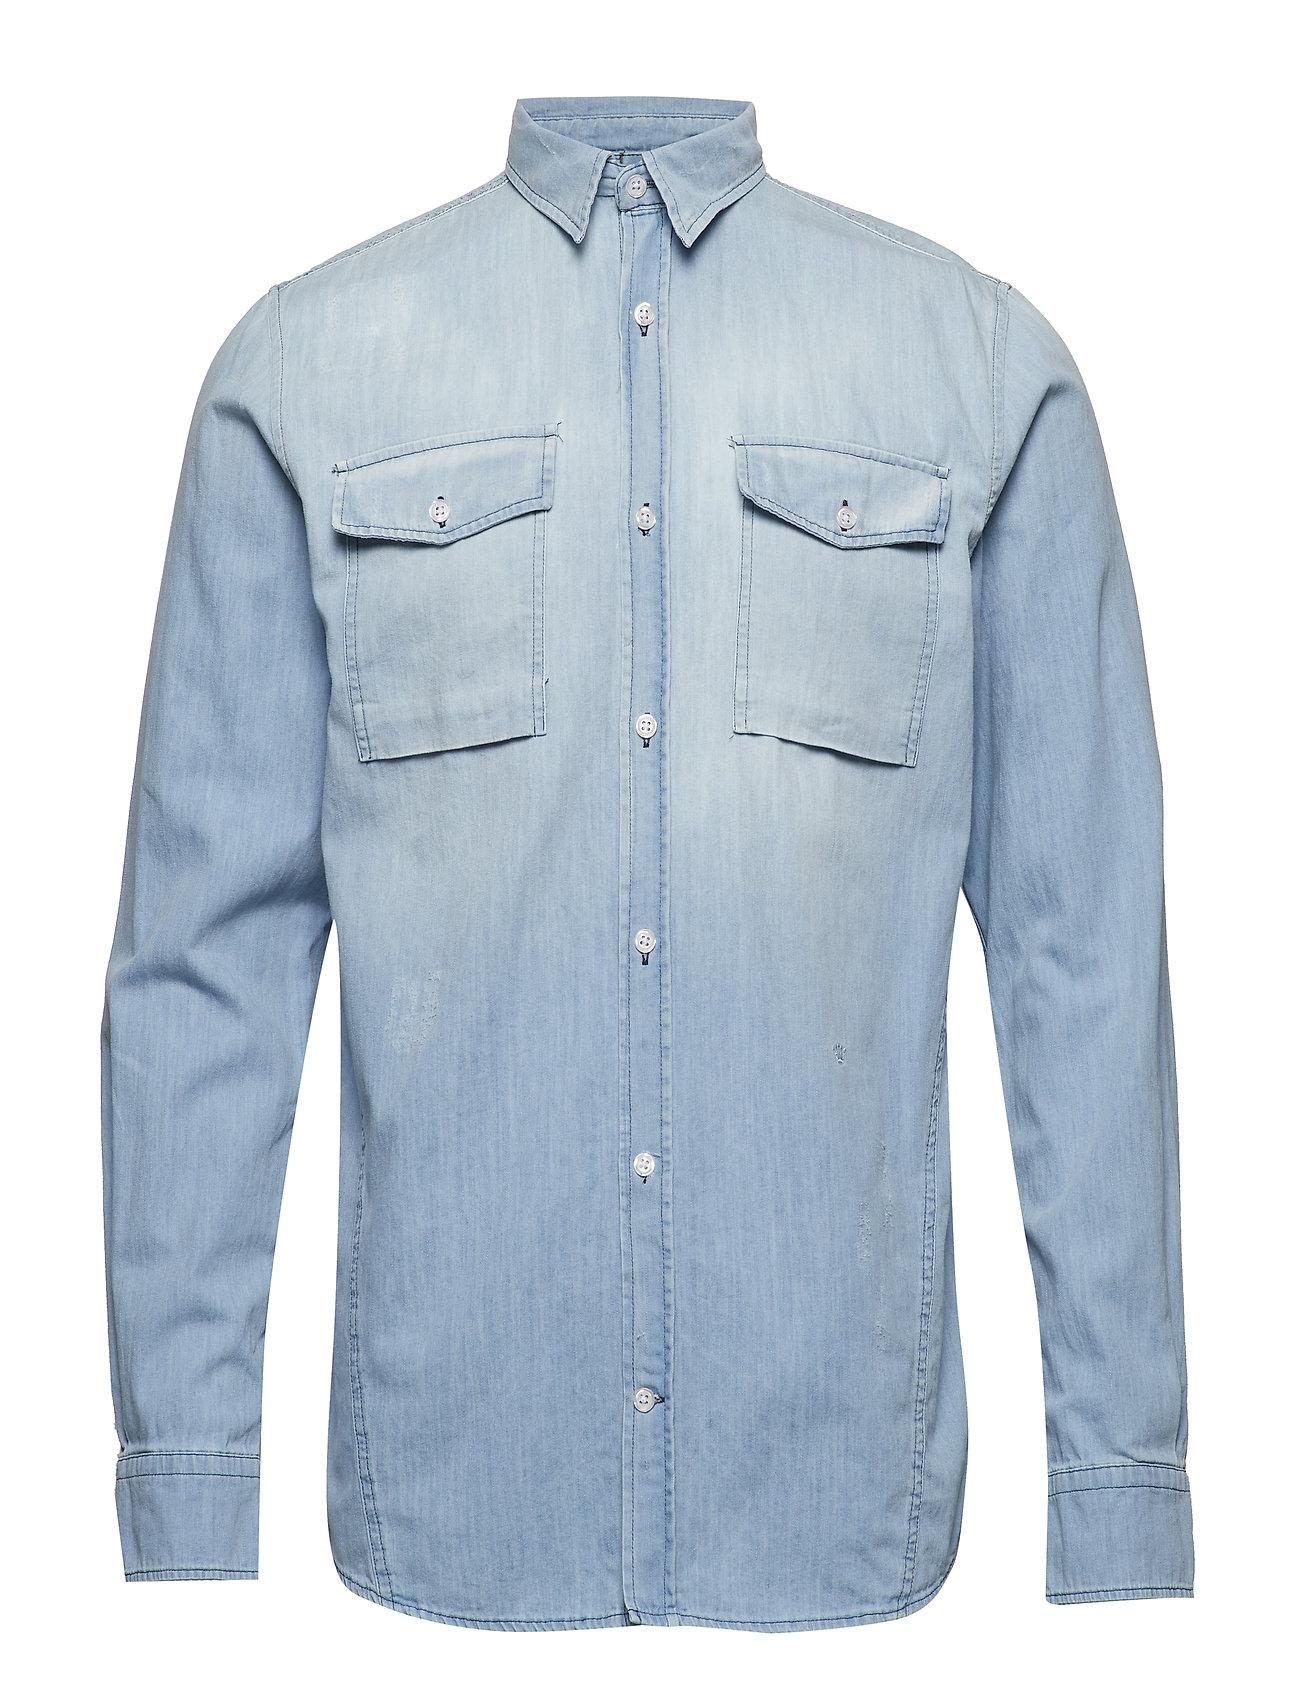 79f1f230ca3 BLEACH INDIGO JUNK de LUXE Washed Indigo L/S Cargo Shirt casual ...